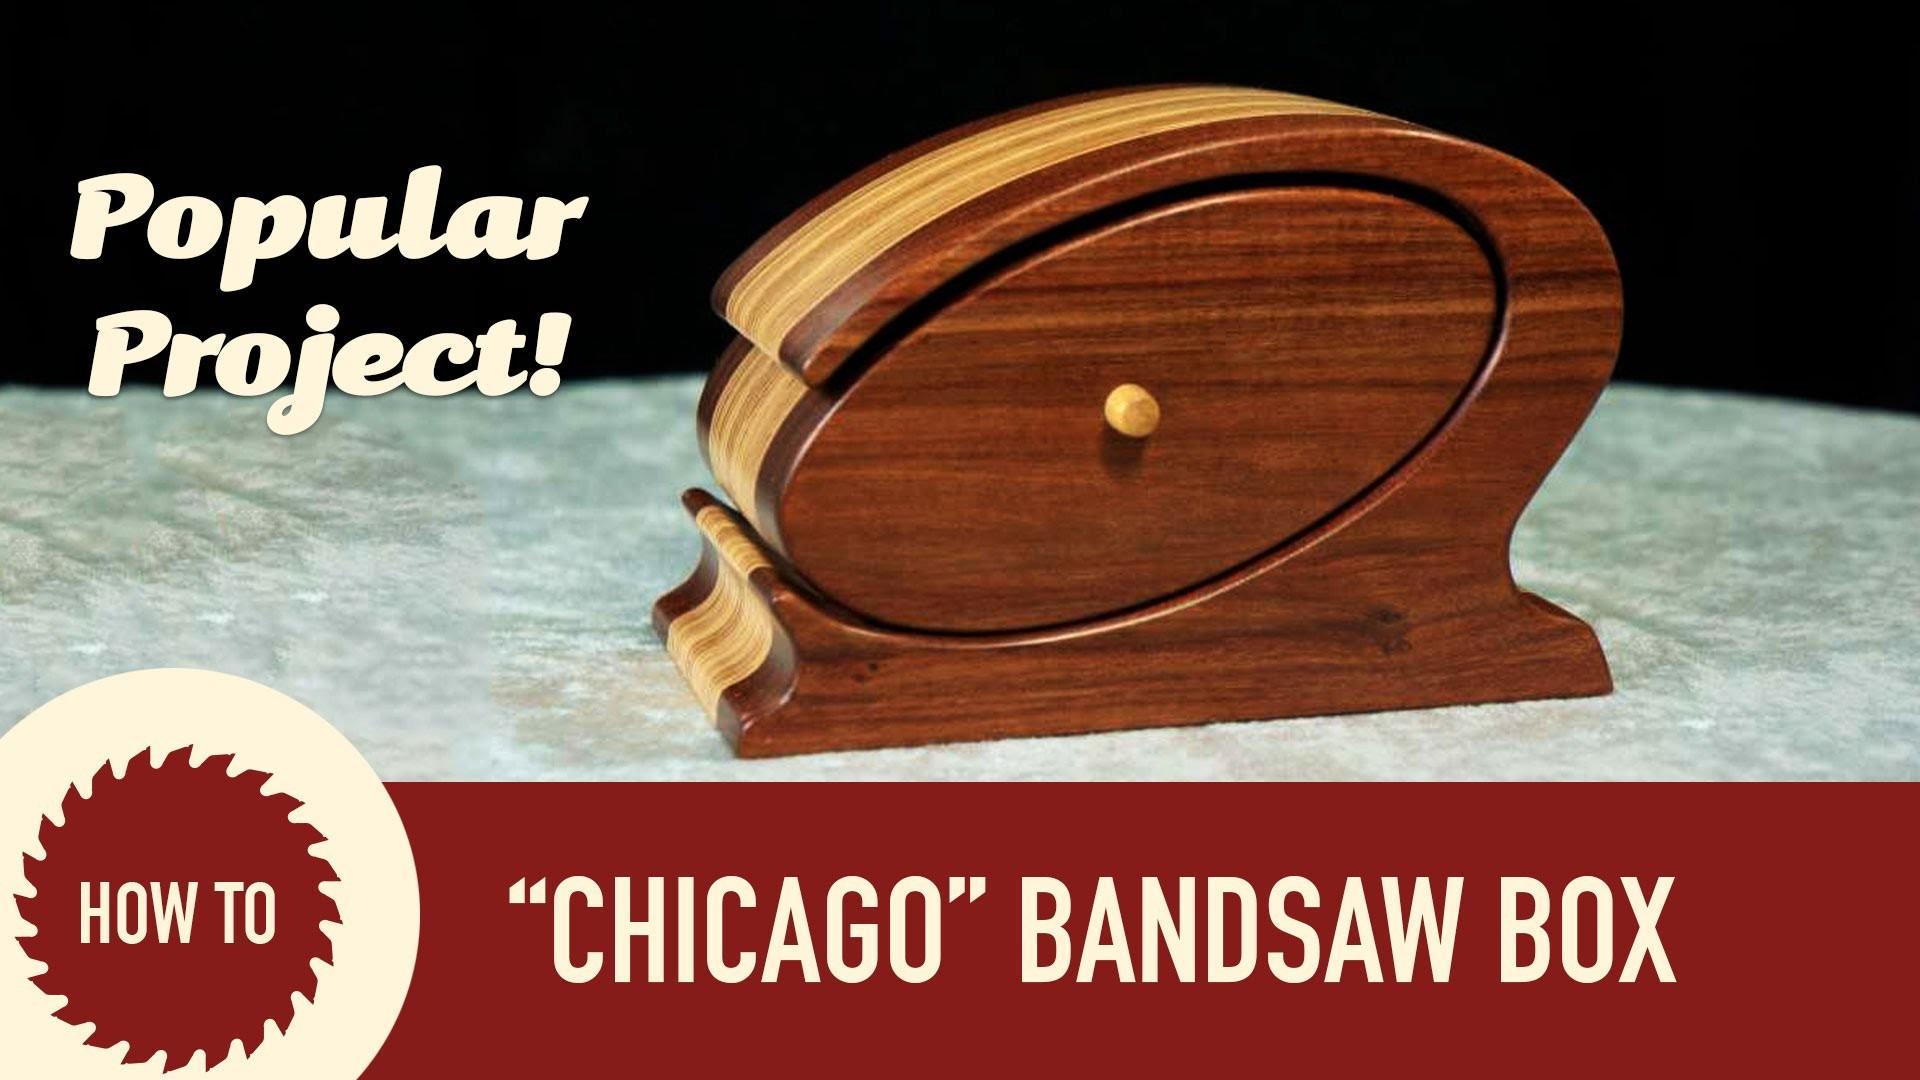 How to Make a Bandsaw Box (Chicago Design)